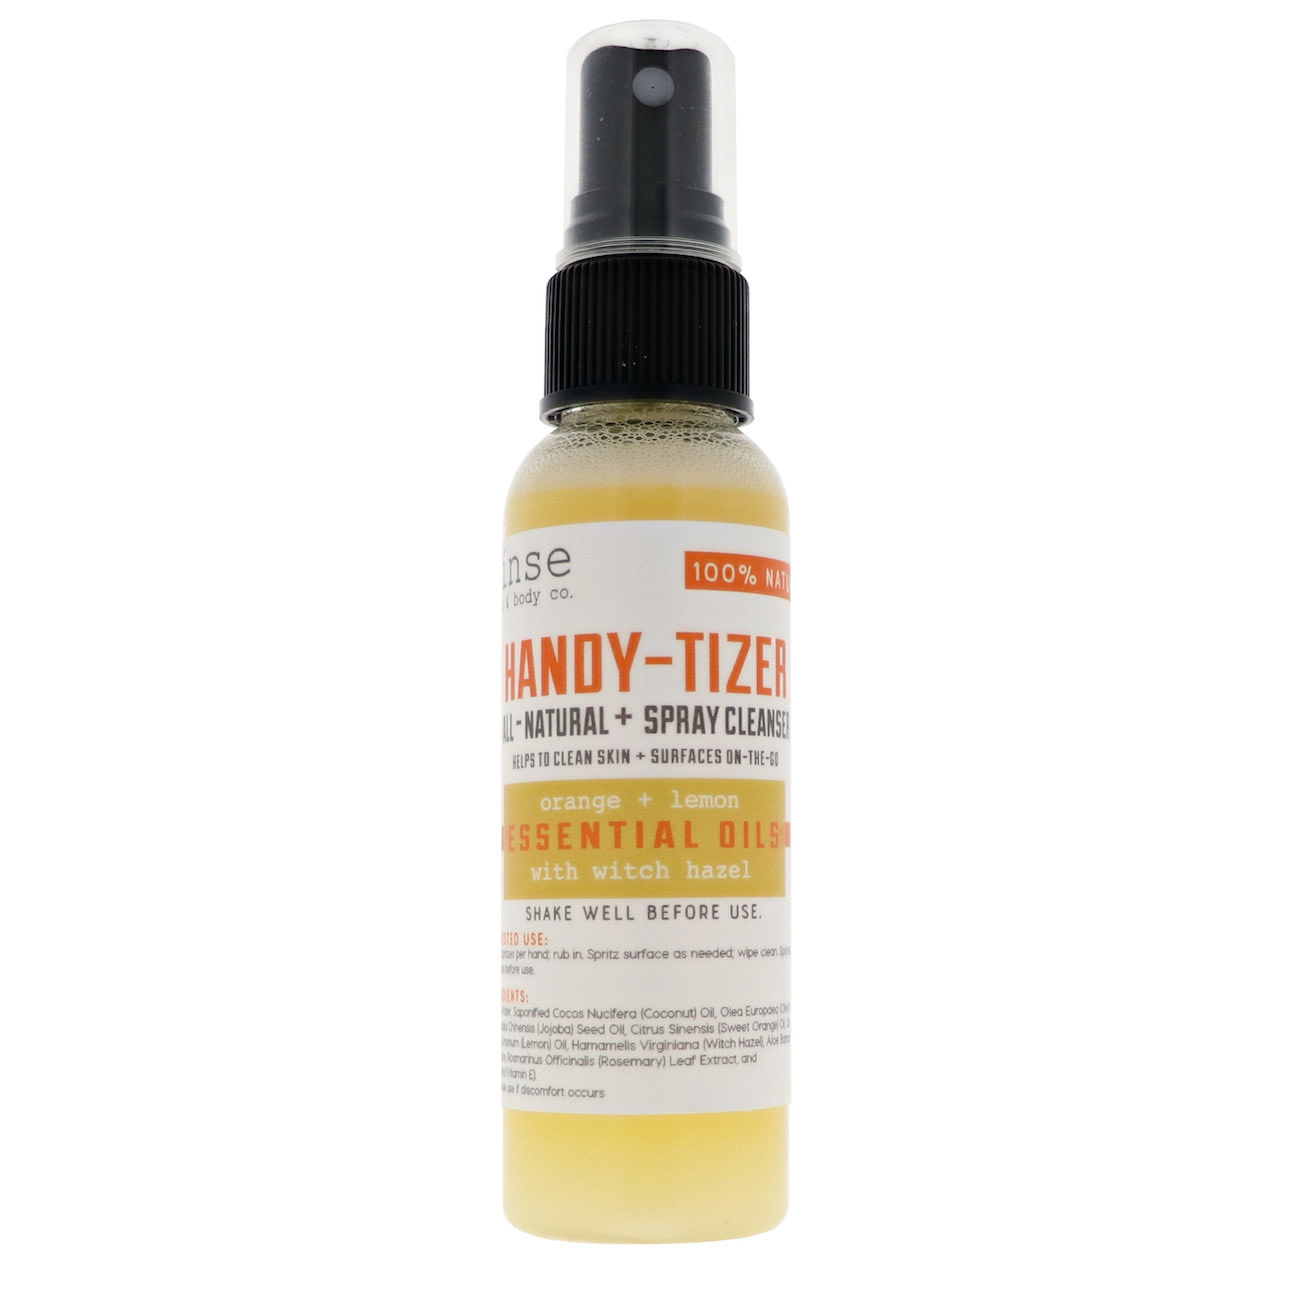 HandyTizer-Orange Lemon